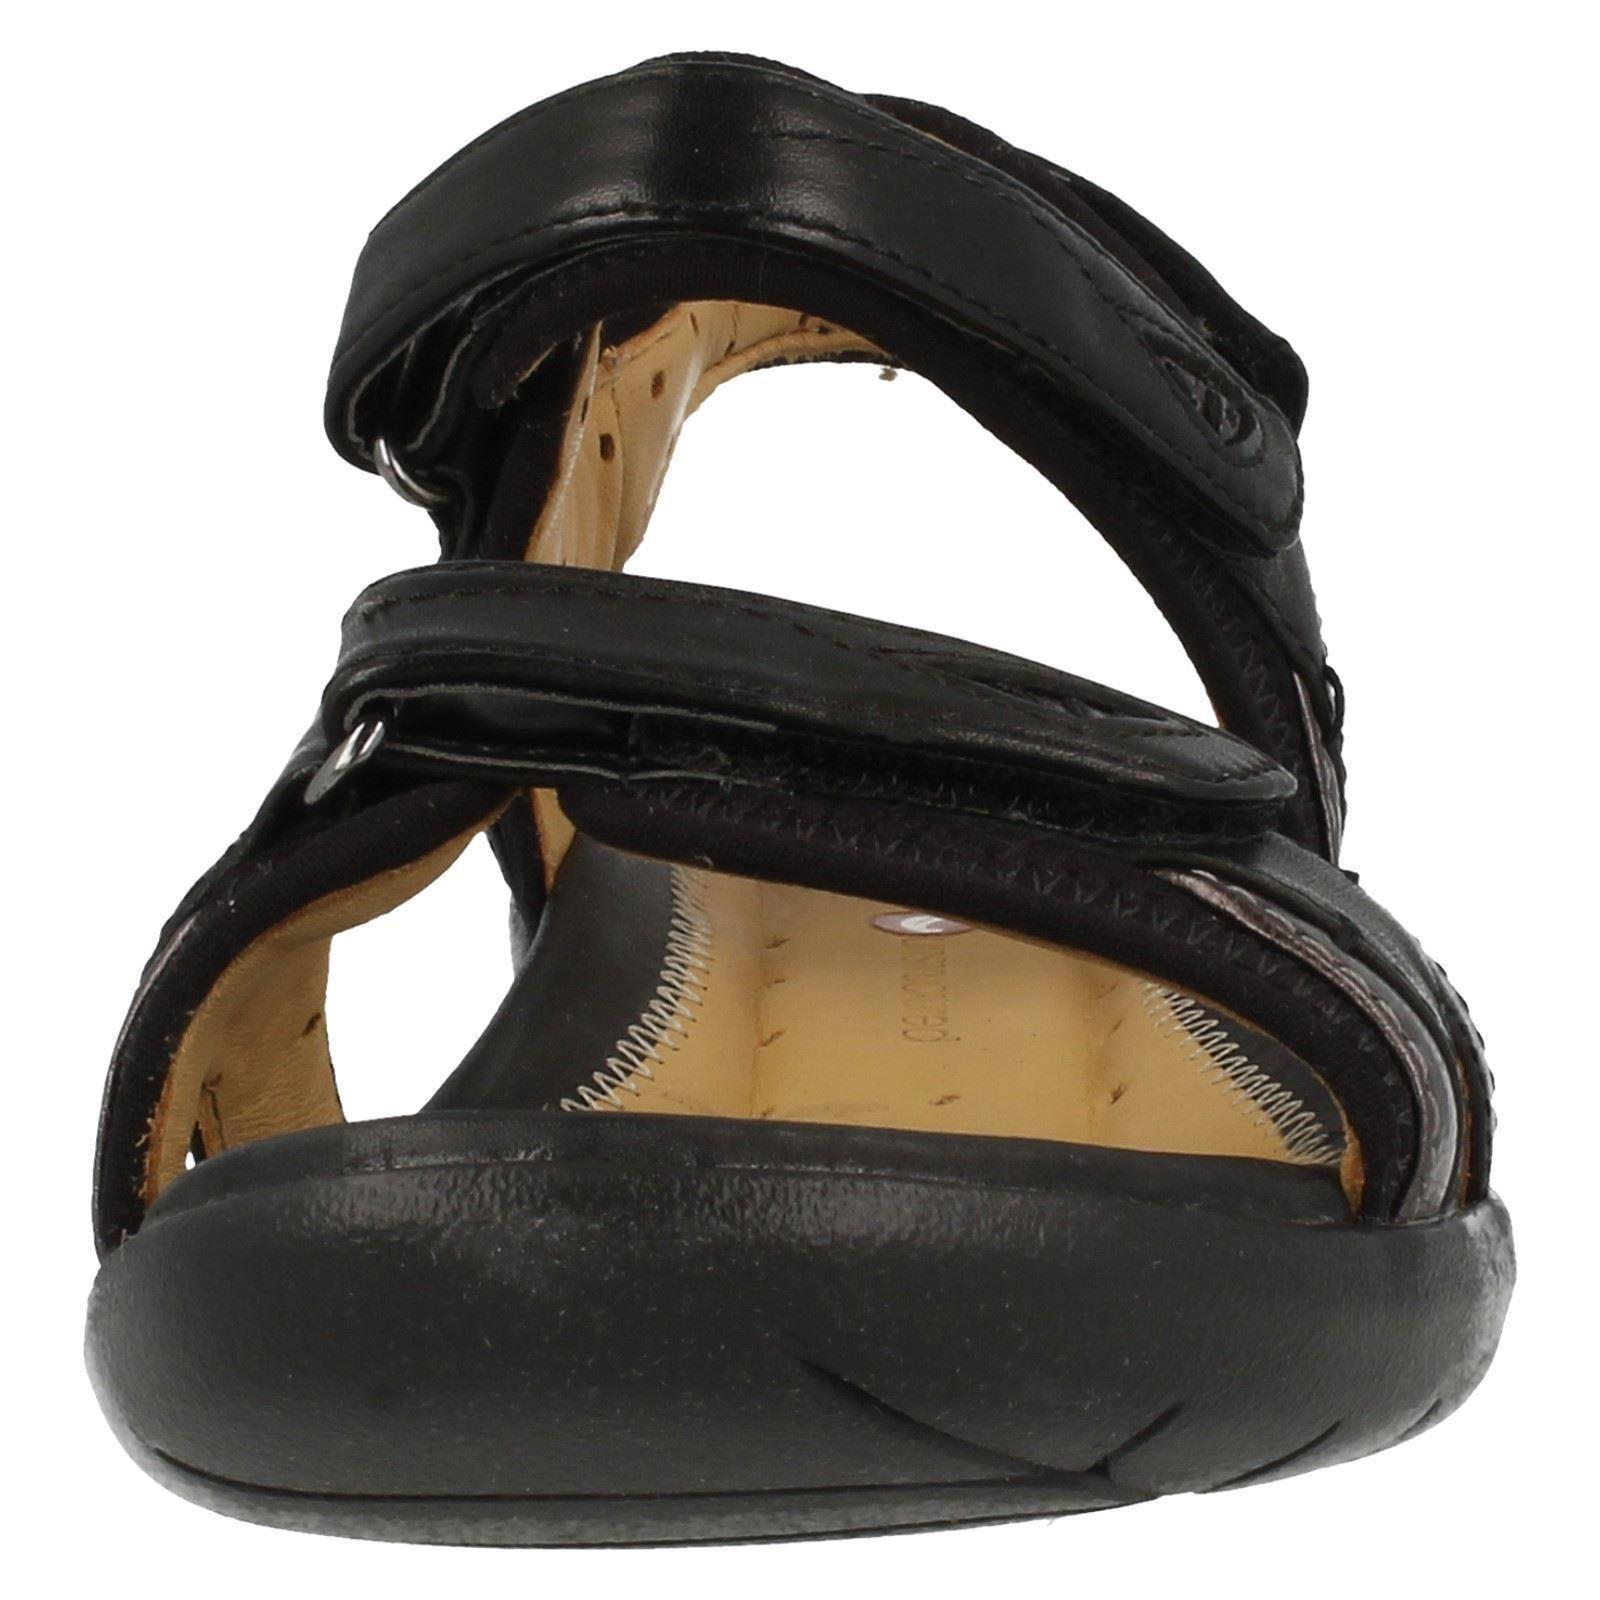 e68c6f946804 Buy clarks sandals 5 cheap